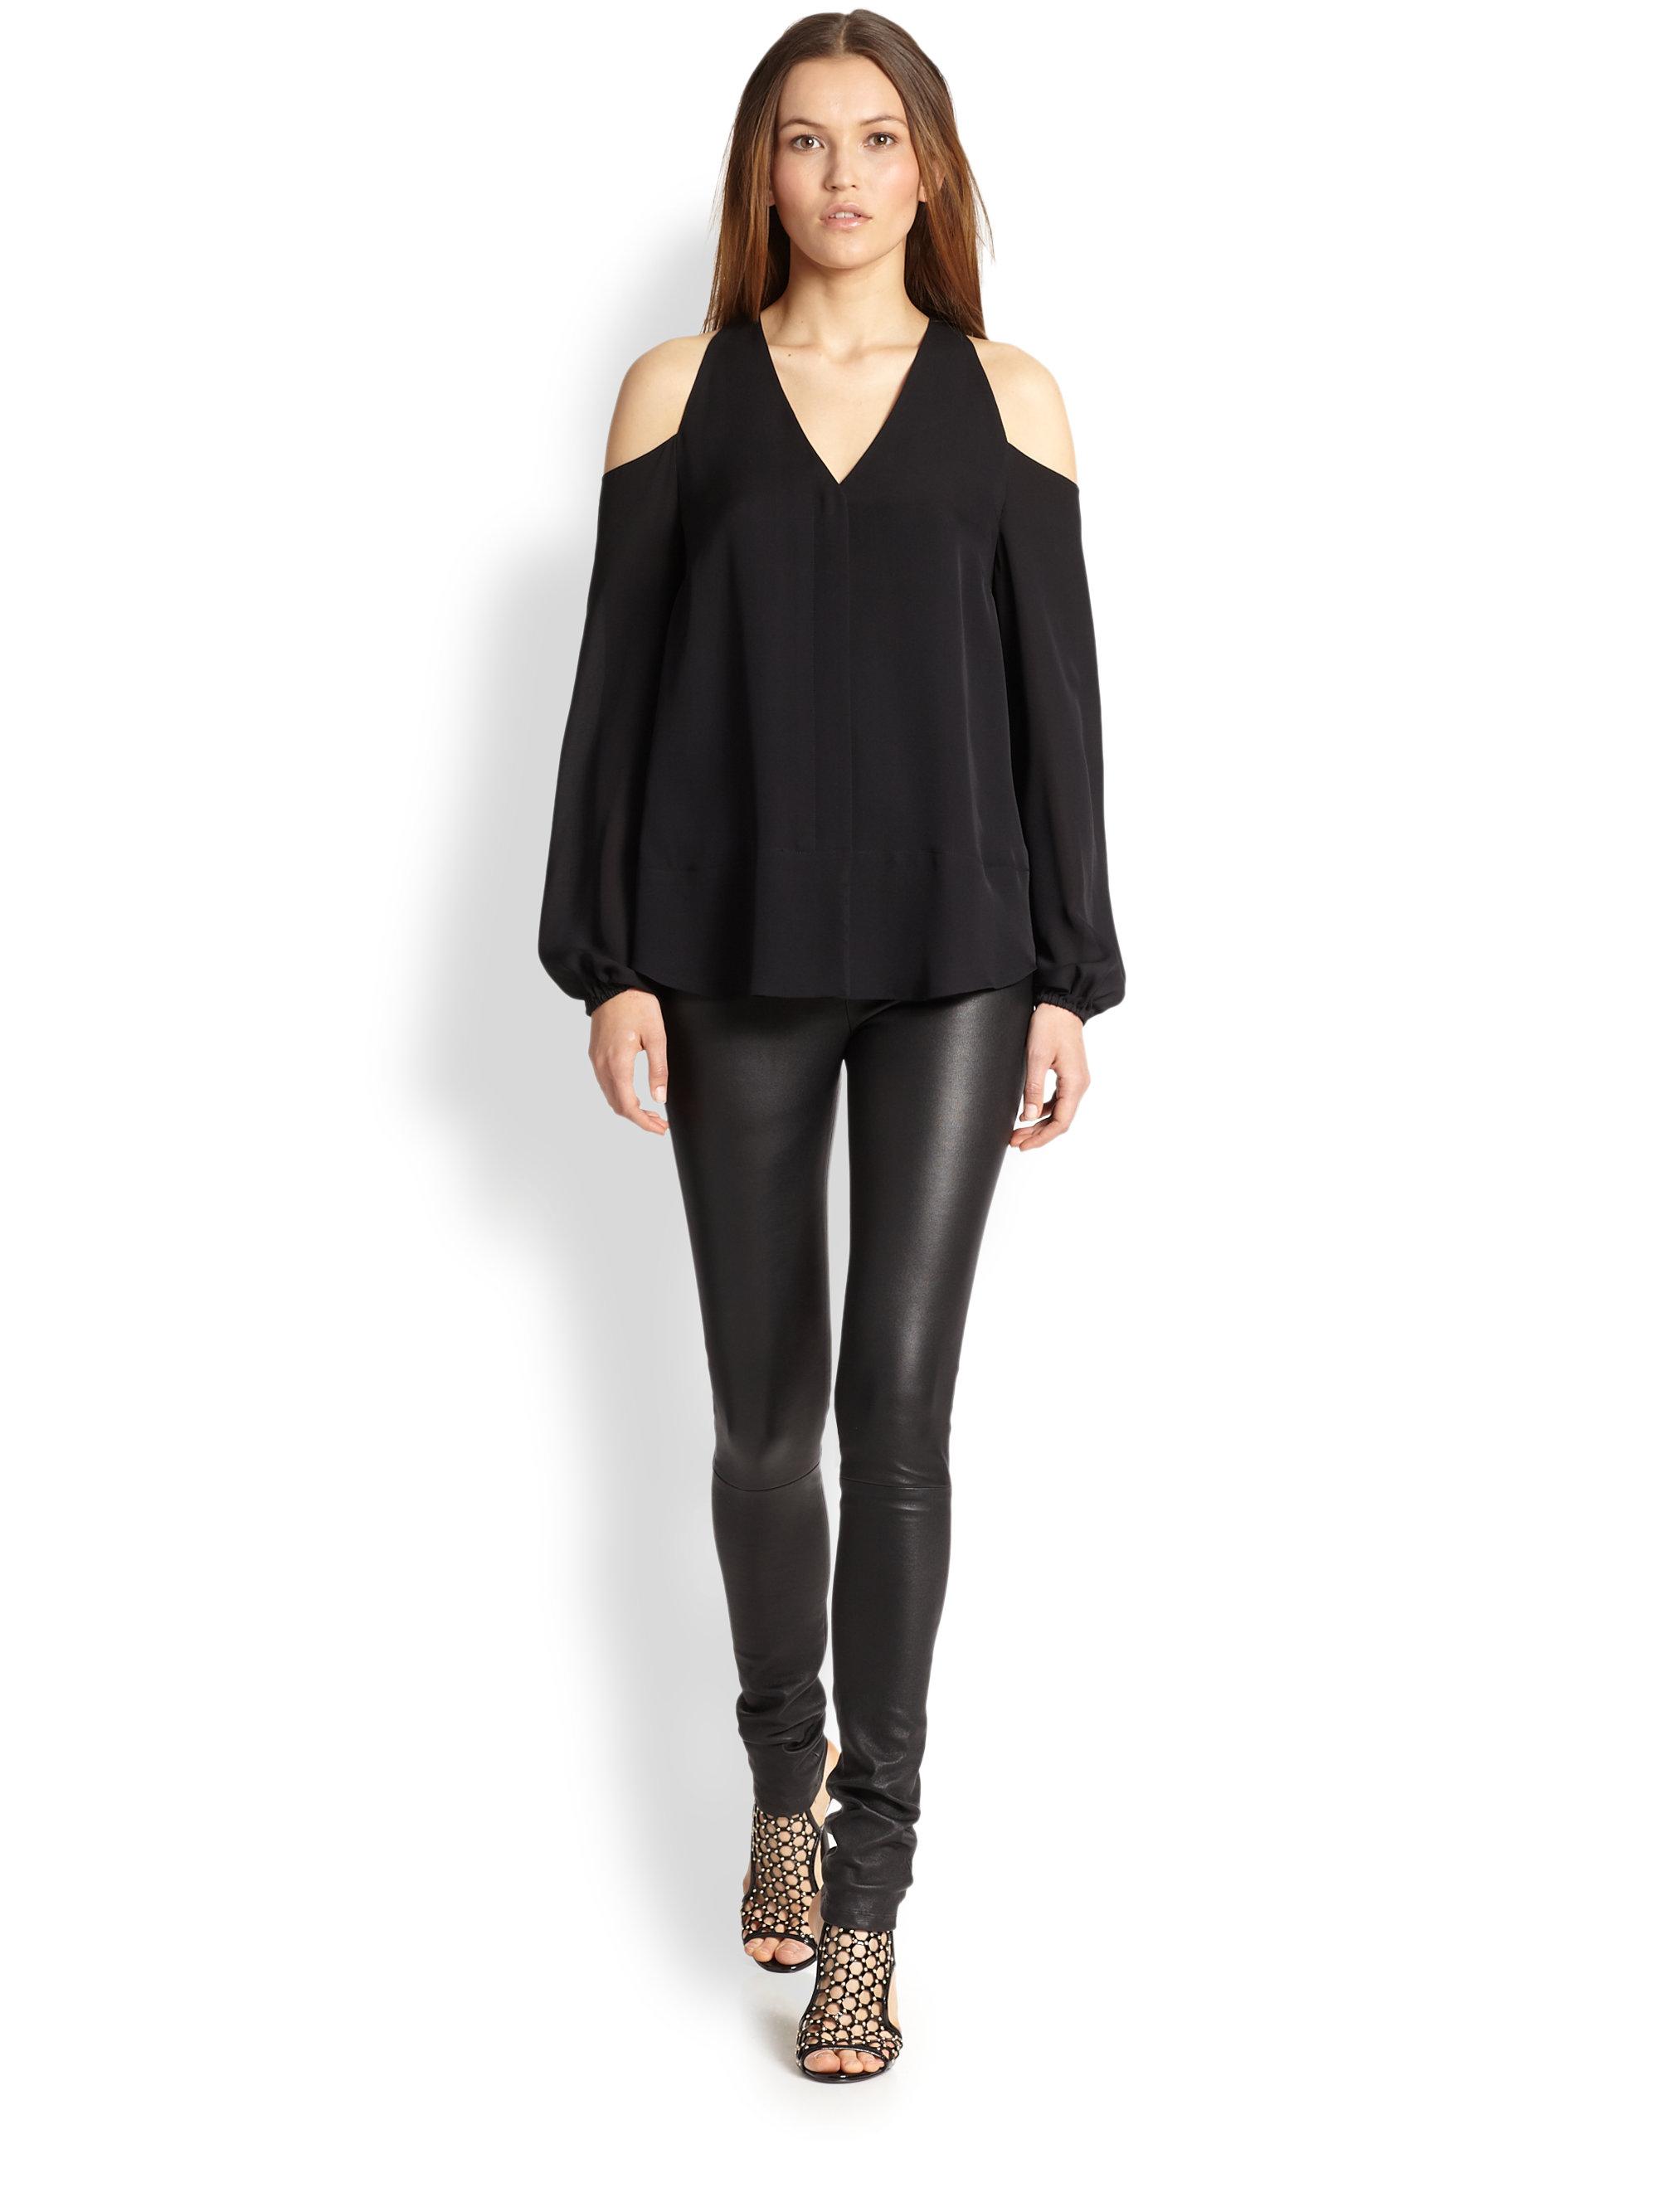 dab8bdf1e08 Tamara Mellon Silk Cold-Shoulder Blouse in Black - Lyst